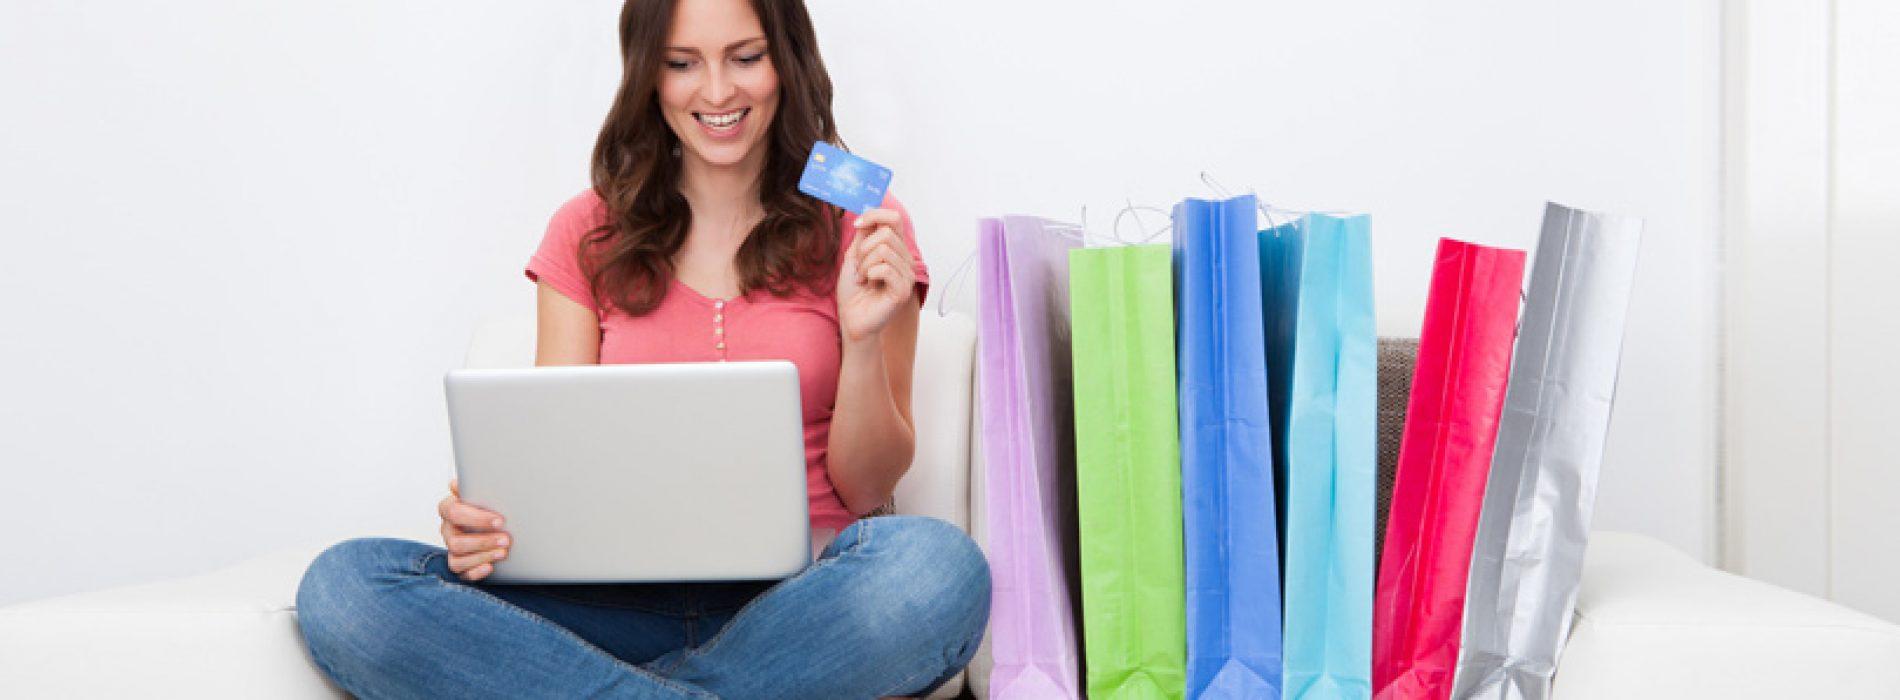 Alışverişte İnternet mi, Mağaza mı?